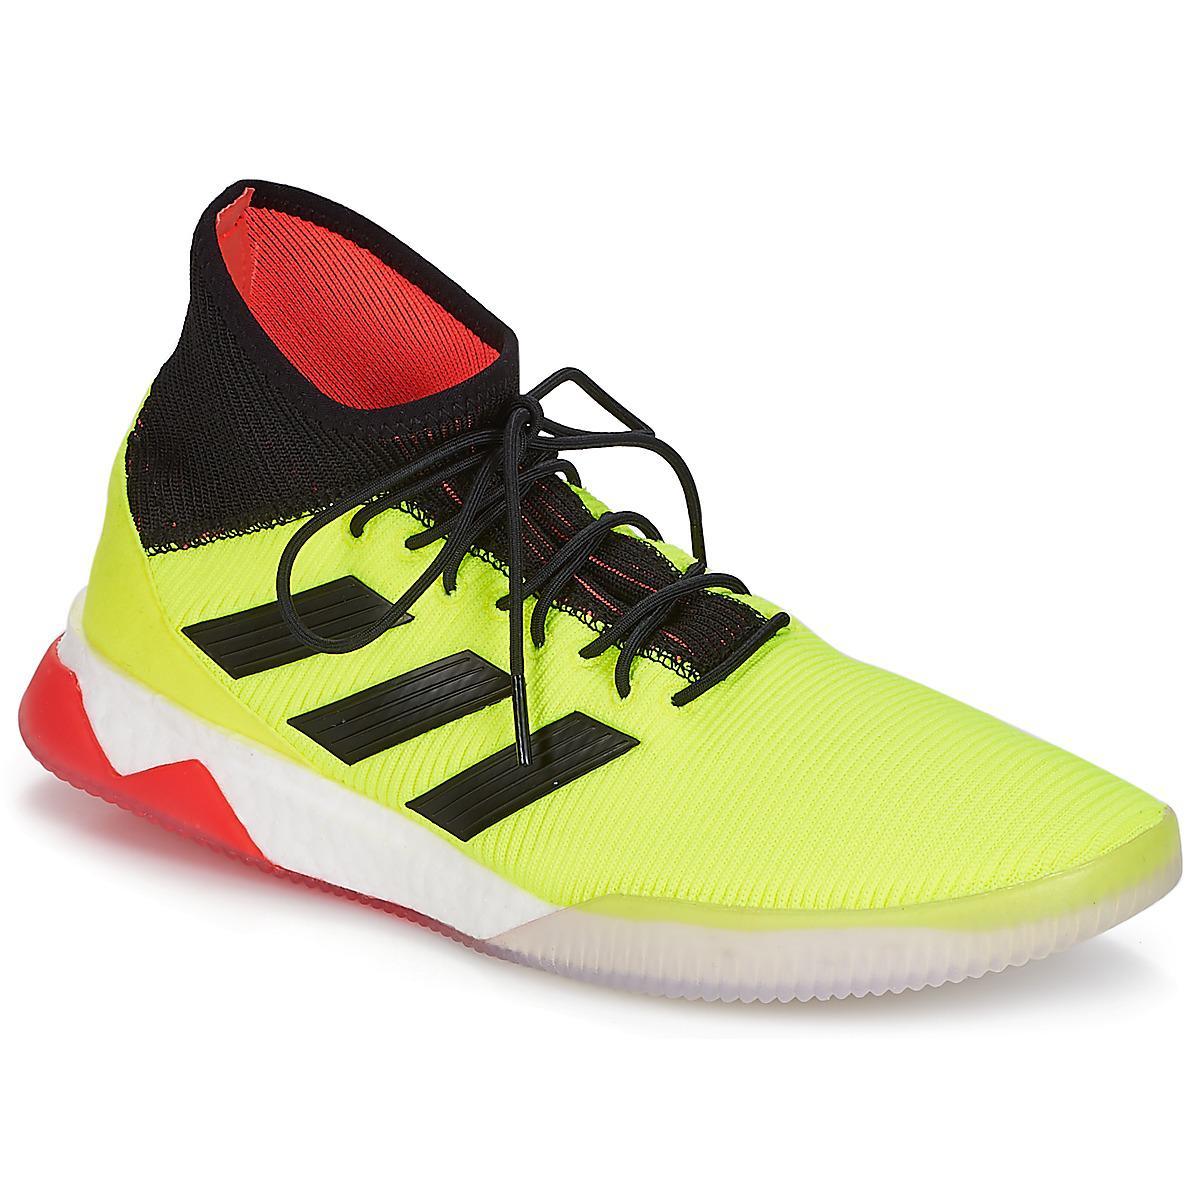 6de4eb816ff adidas Predator Tango 18.1 Tr Football Boots in Yellow for Men - Lyst